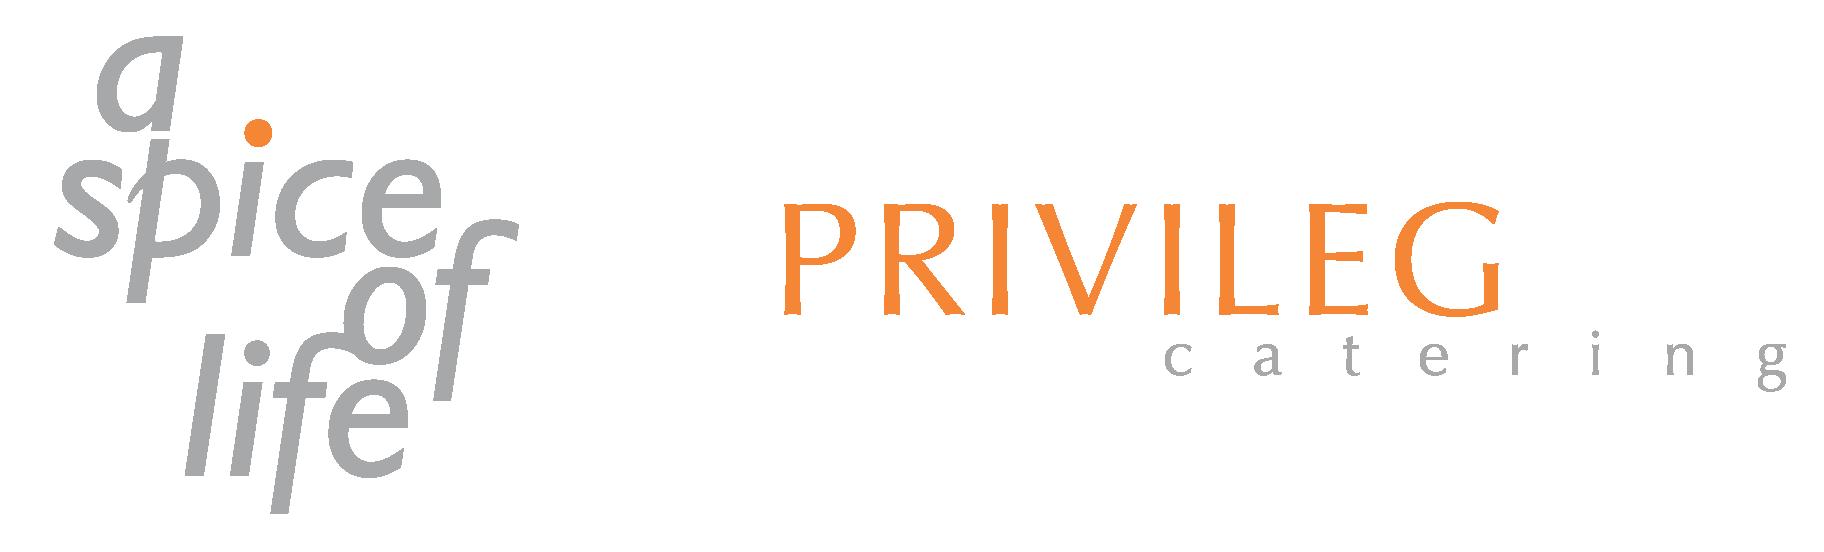 Privileg Catering